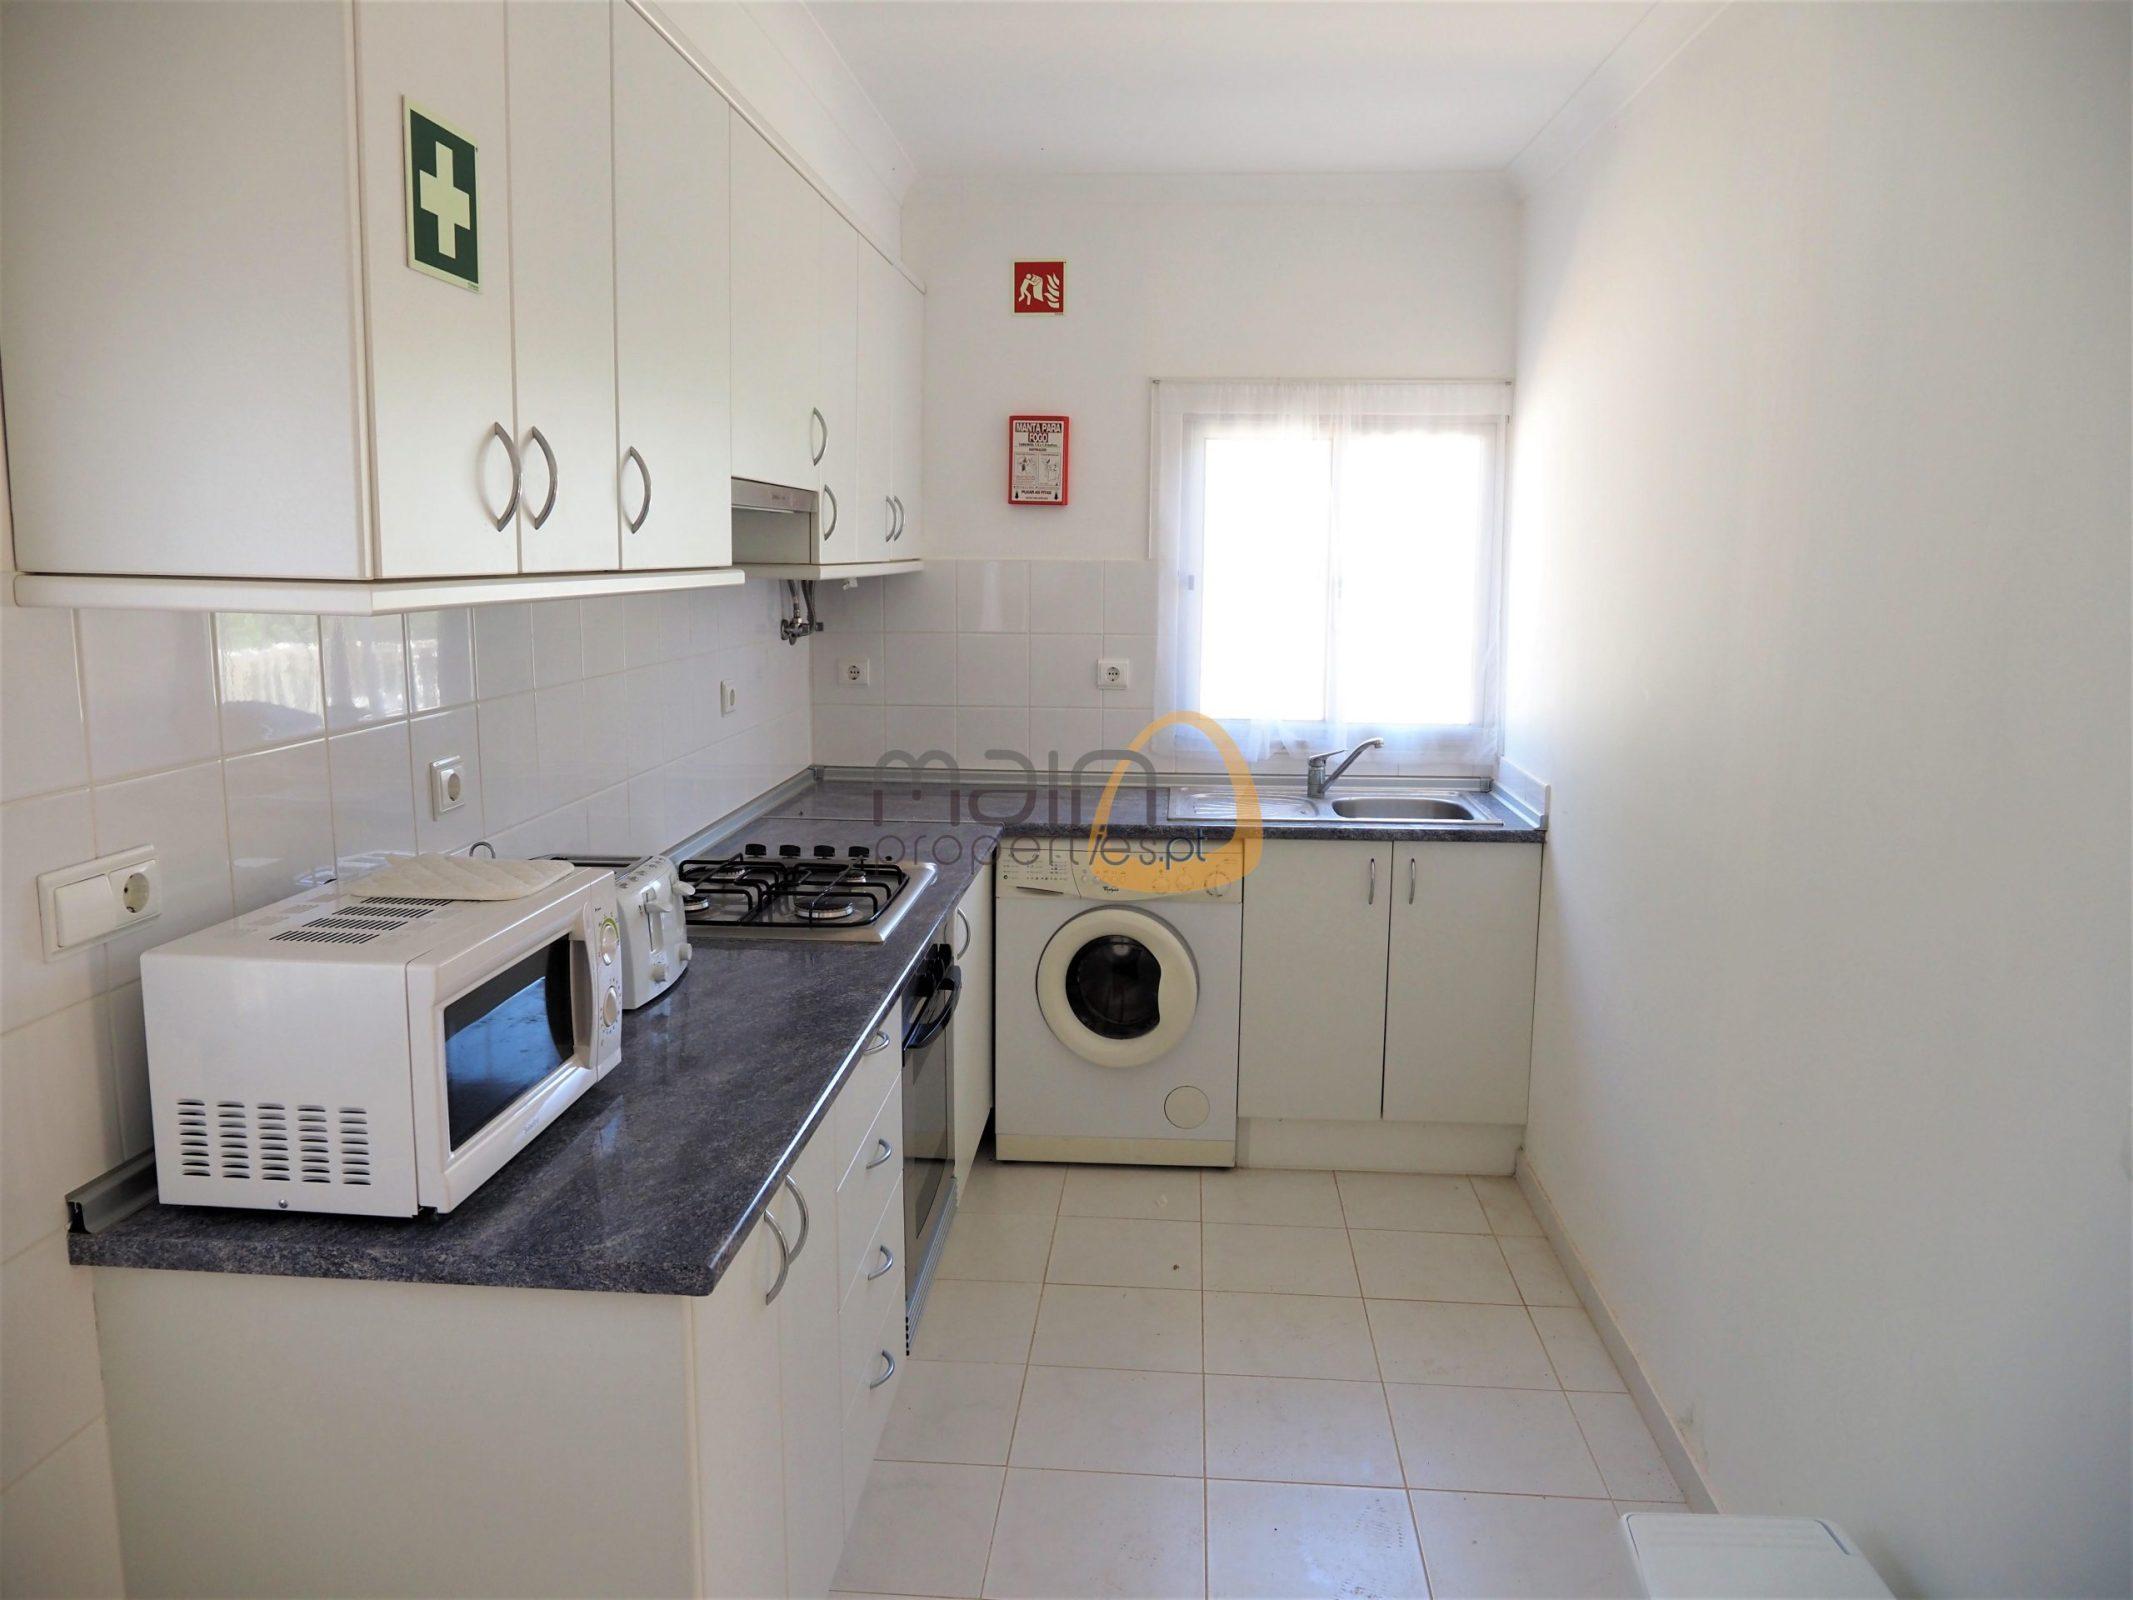 Cozinha anexo 4